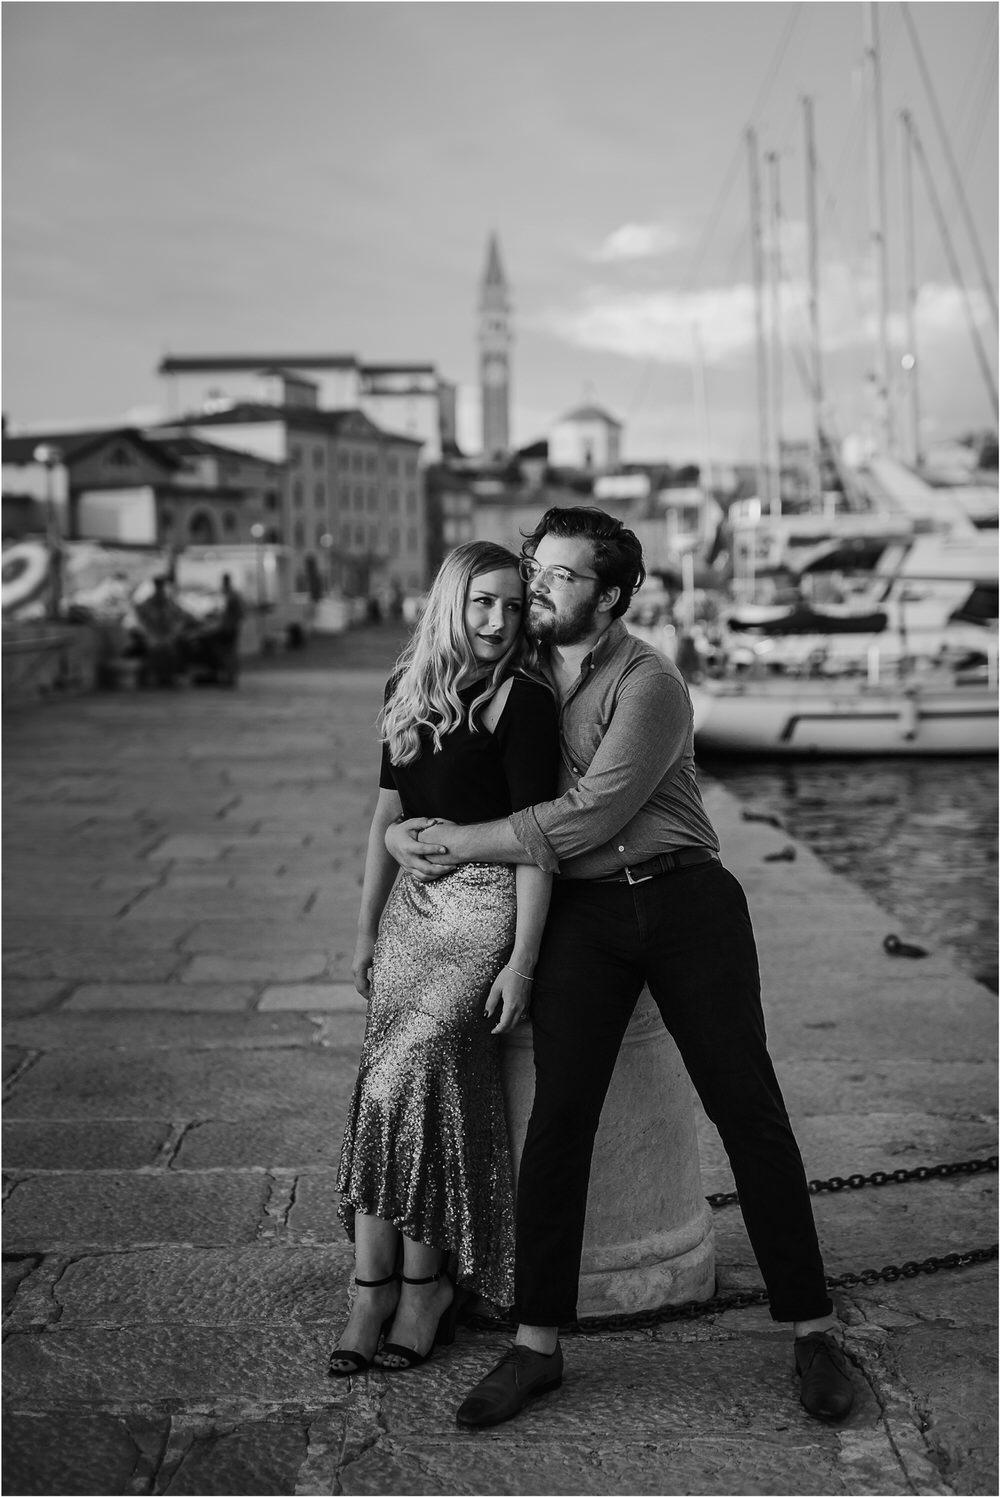 piran wedding photographer engagement anniversary honeymoon photography recommended slovenia seaside photographer  0041.jpg